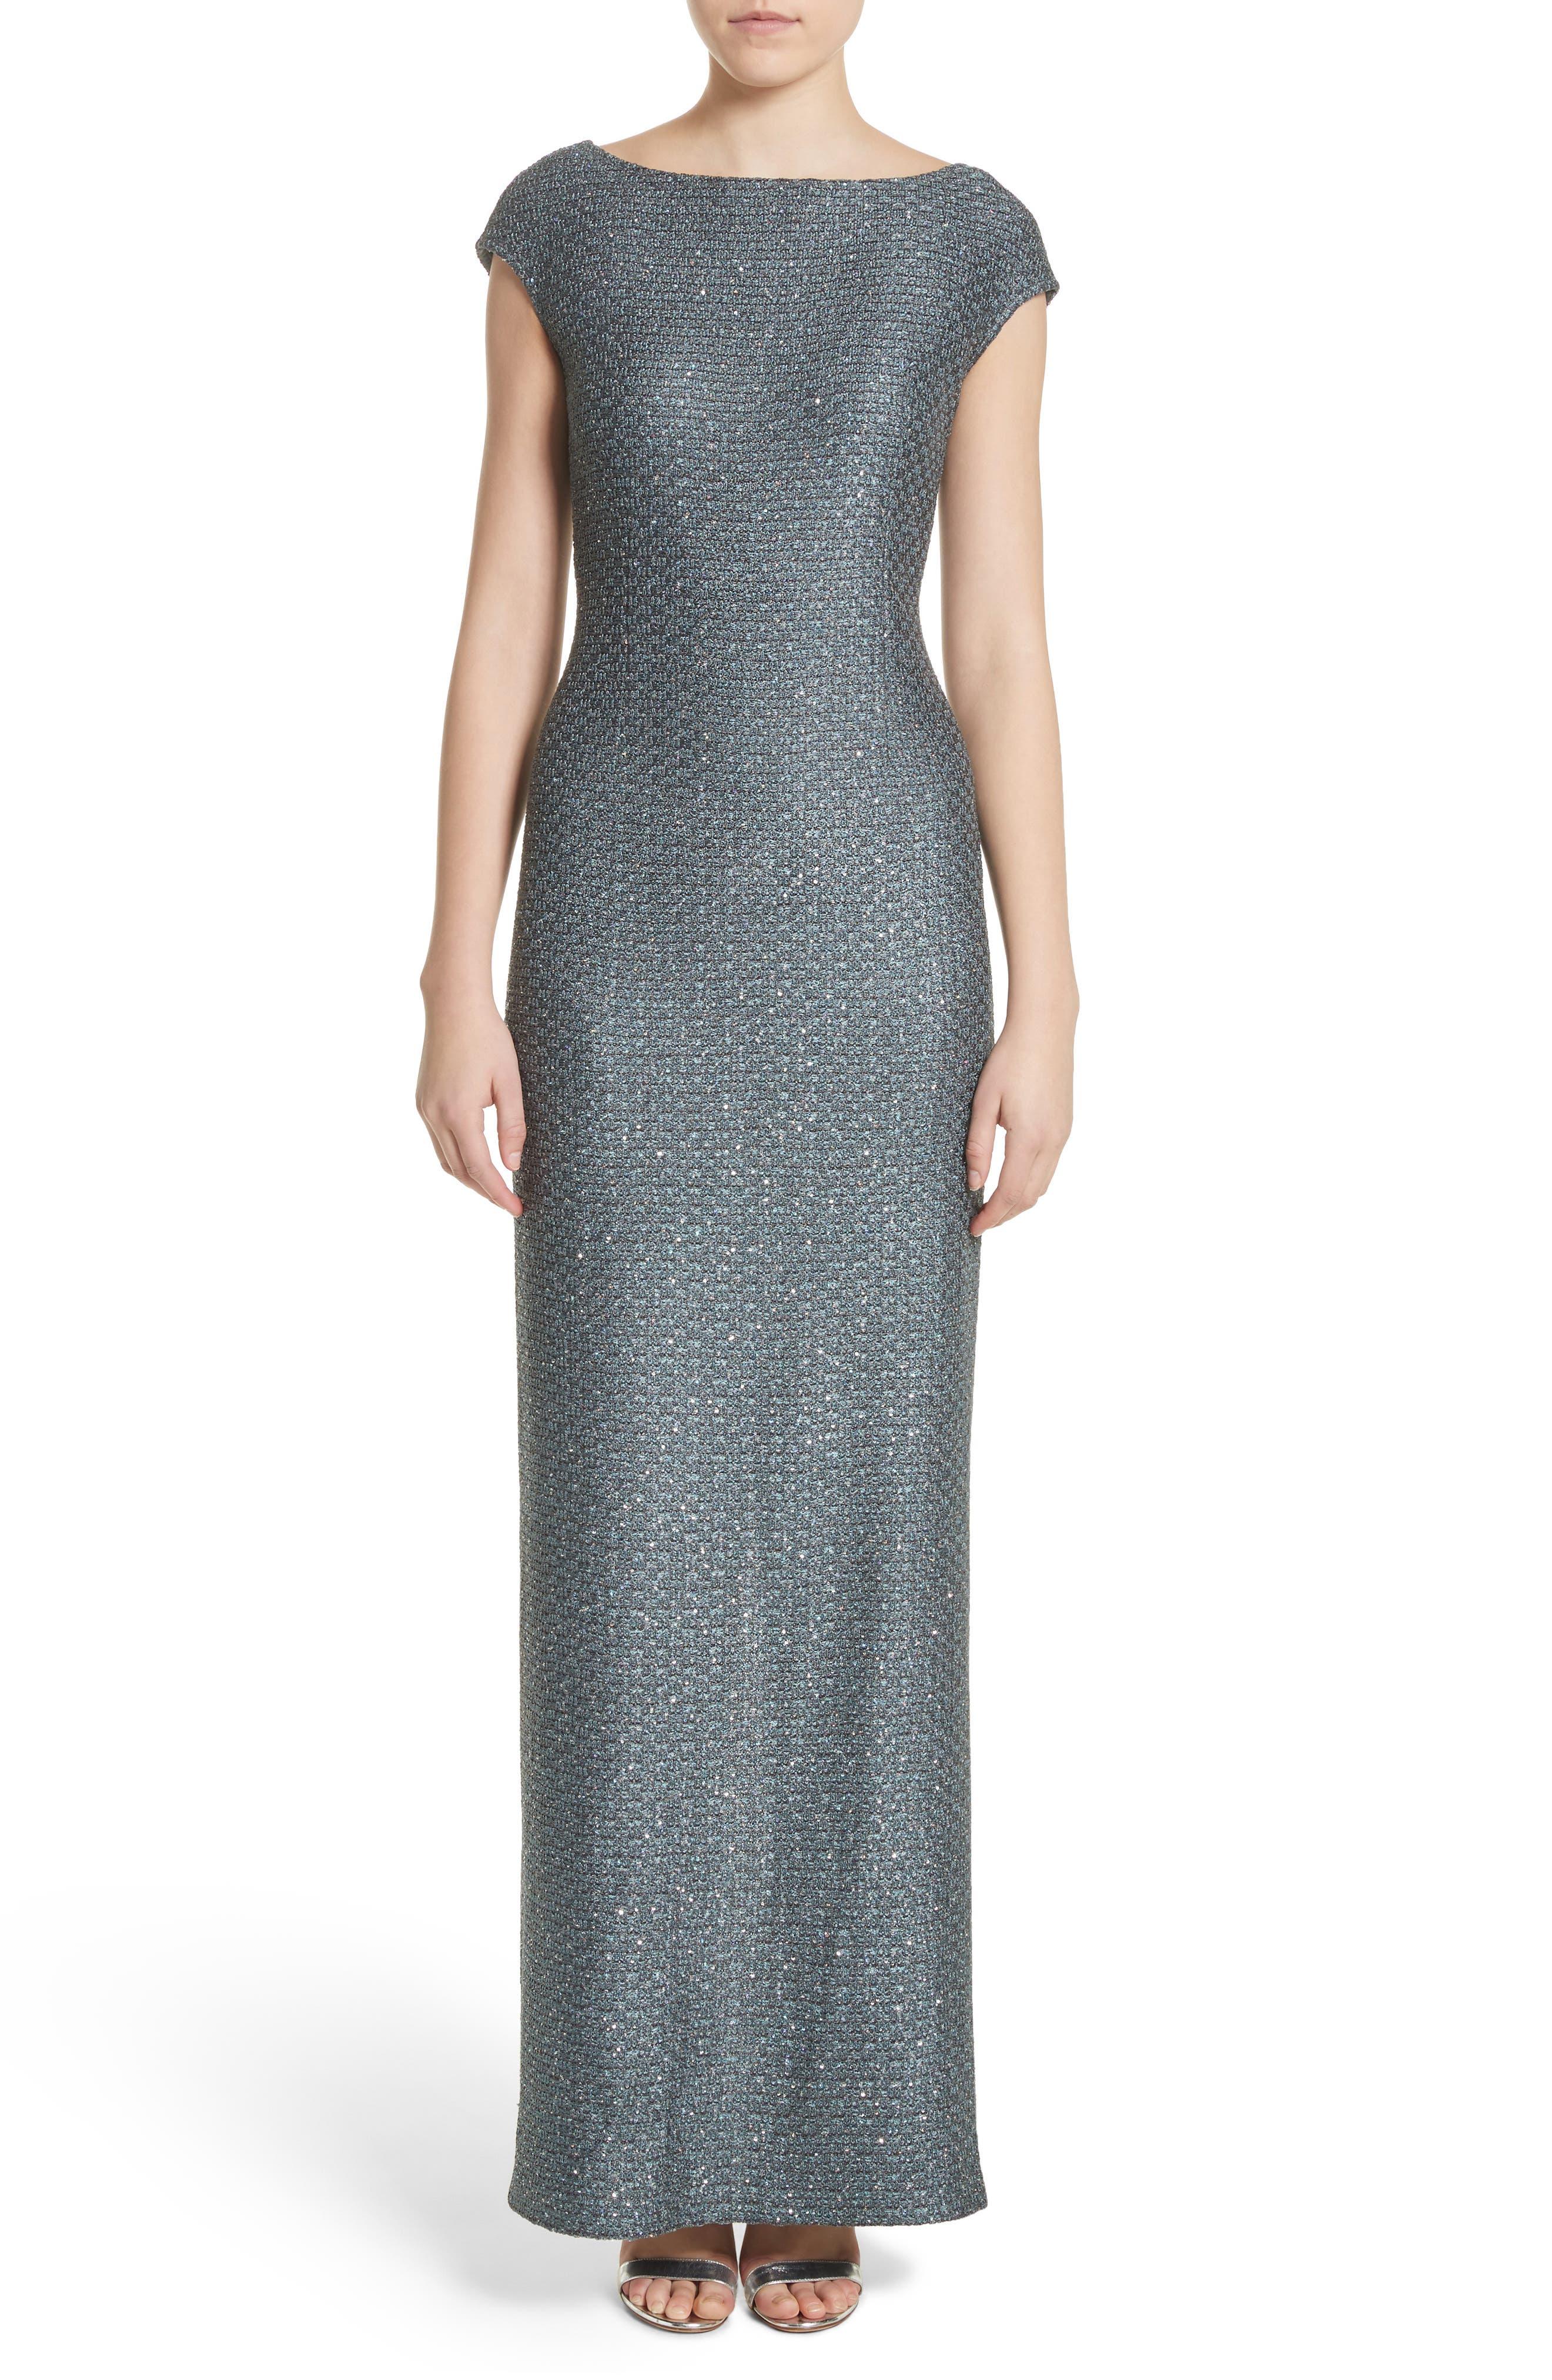 Main Image - St. John Evening Spark Sequin Hansh Knit Column Gown